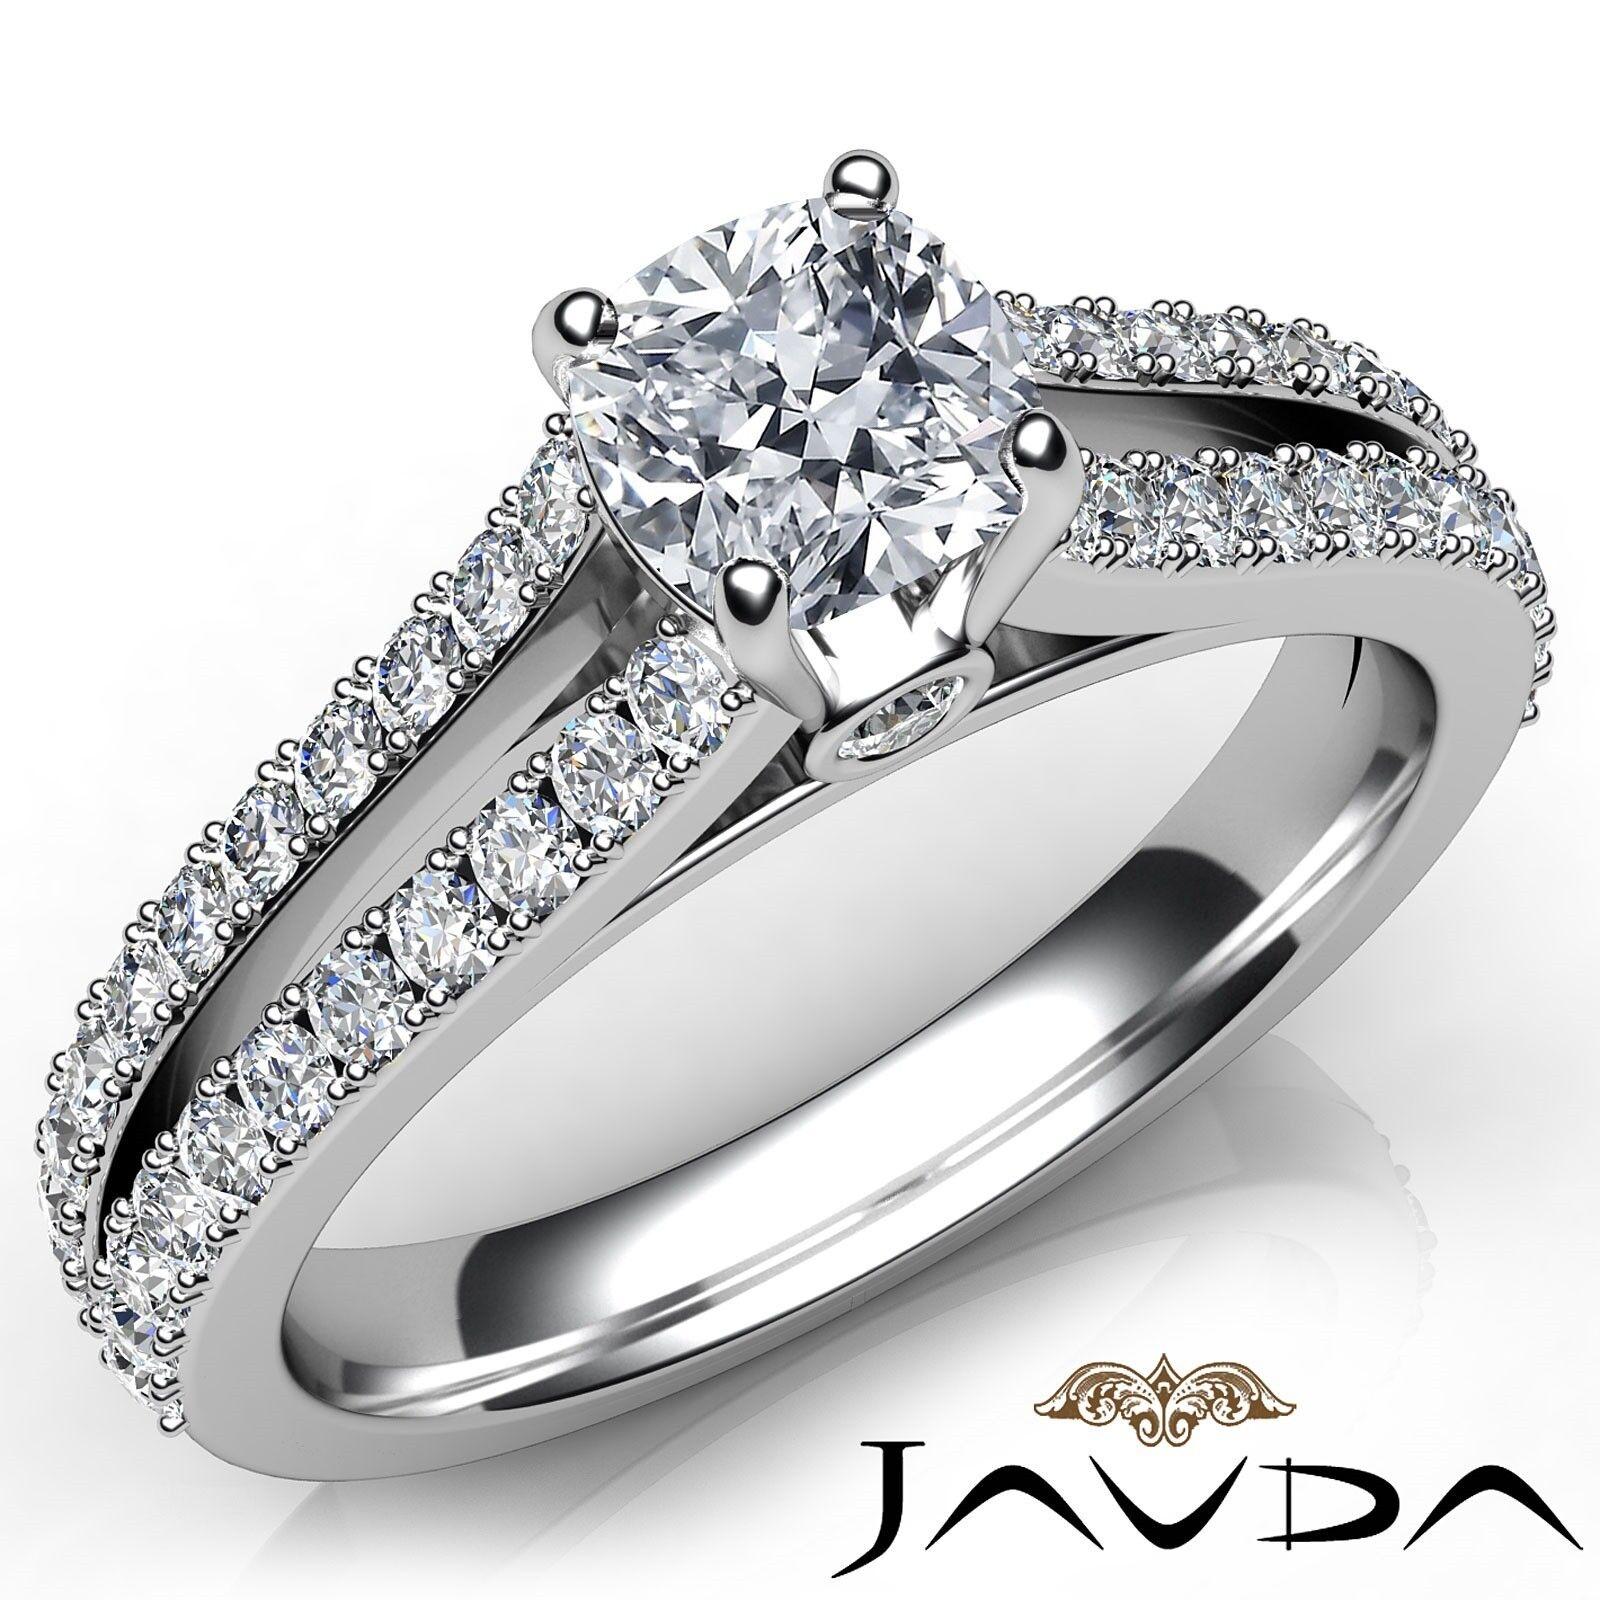 1.65ctw Double Prong Split Shank Cushion Diamond Engagement Ring GIA F-VVS2 Gold